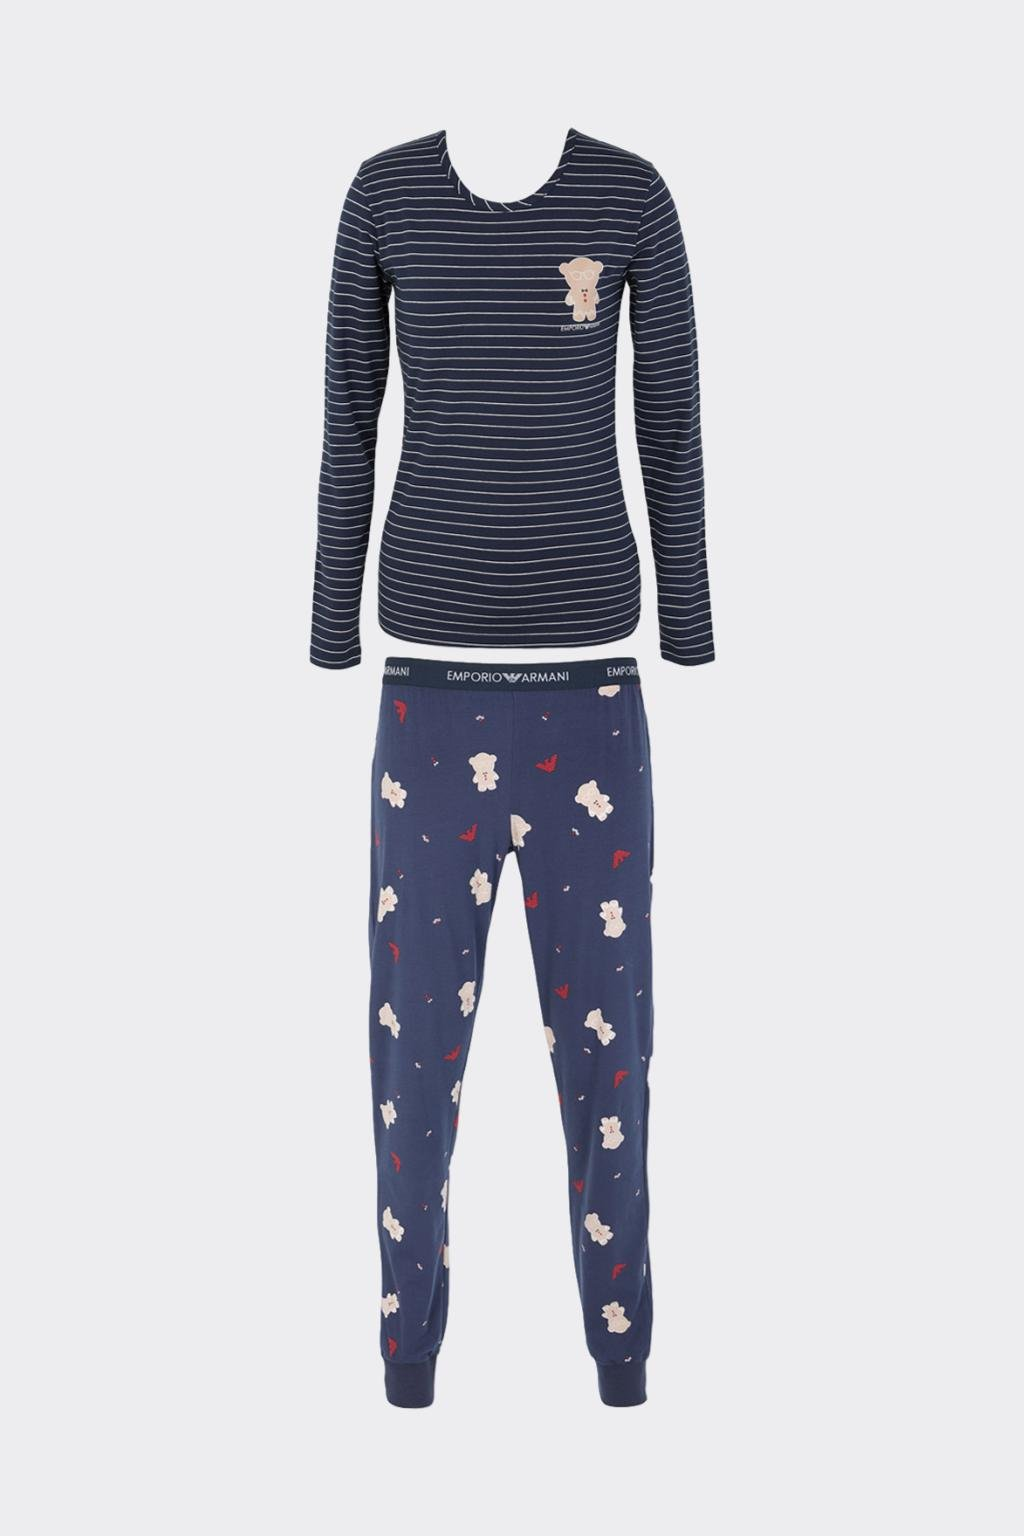 Emporio Armani Ginger Bread pyžamo dámské - modré